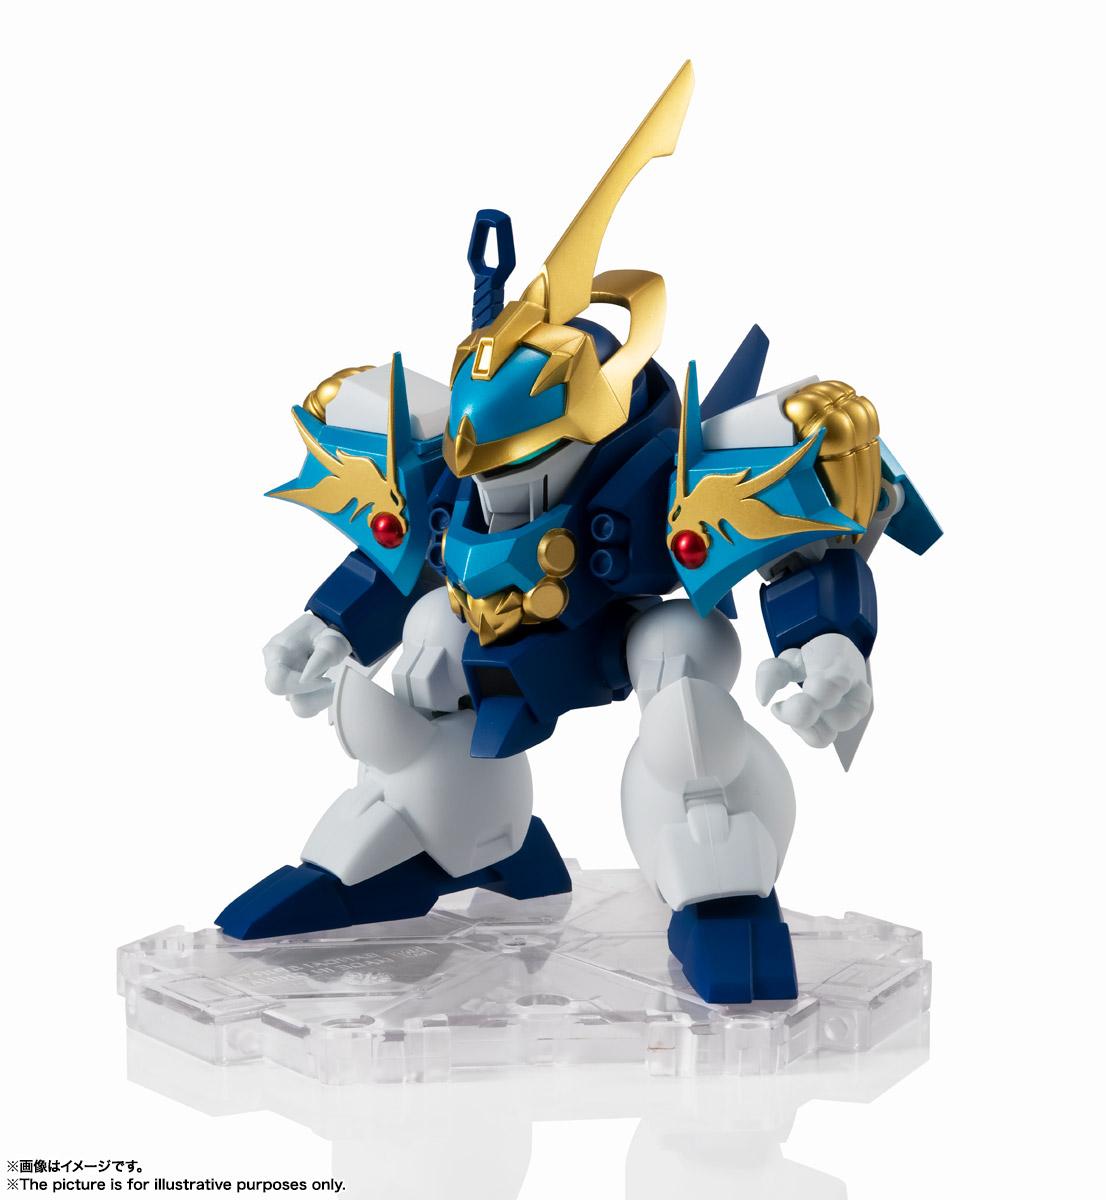 NXEDGE STYLE[MASHIN UNIT]『龍蒼丸』魔神英雄伝ワタル 可動フィギュア-006